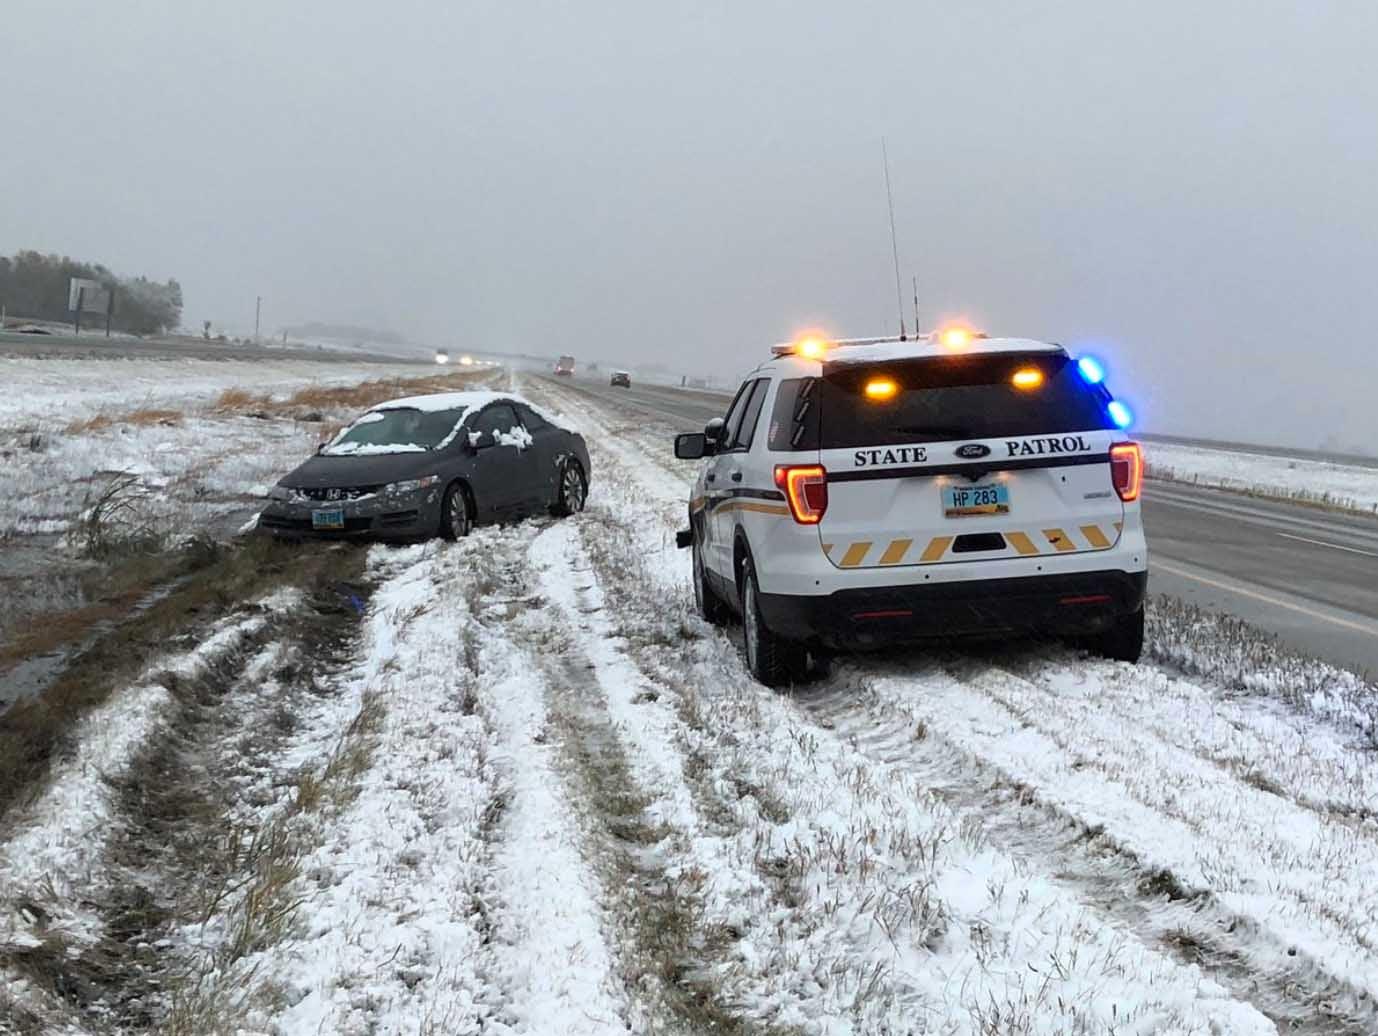 Snowstorm Closes North Dakota Interstates; Highway Patrol Assists Dozens of Stranded Motorists